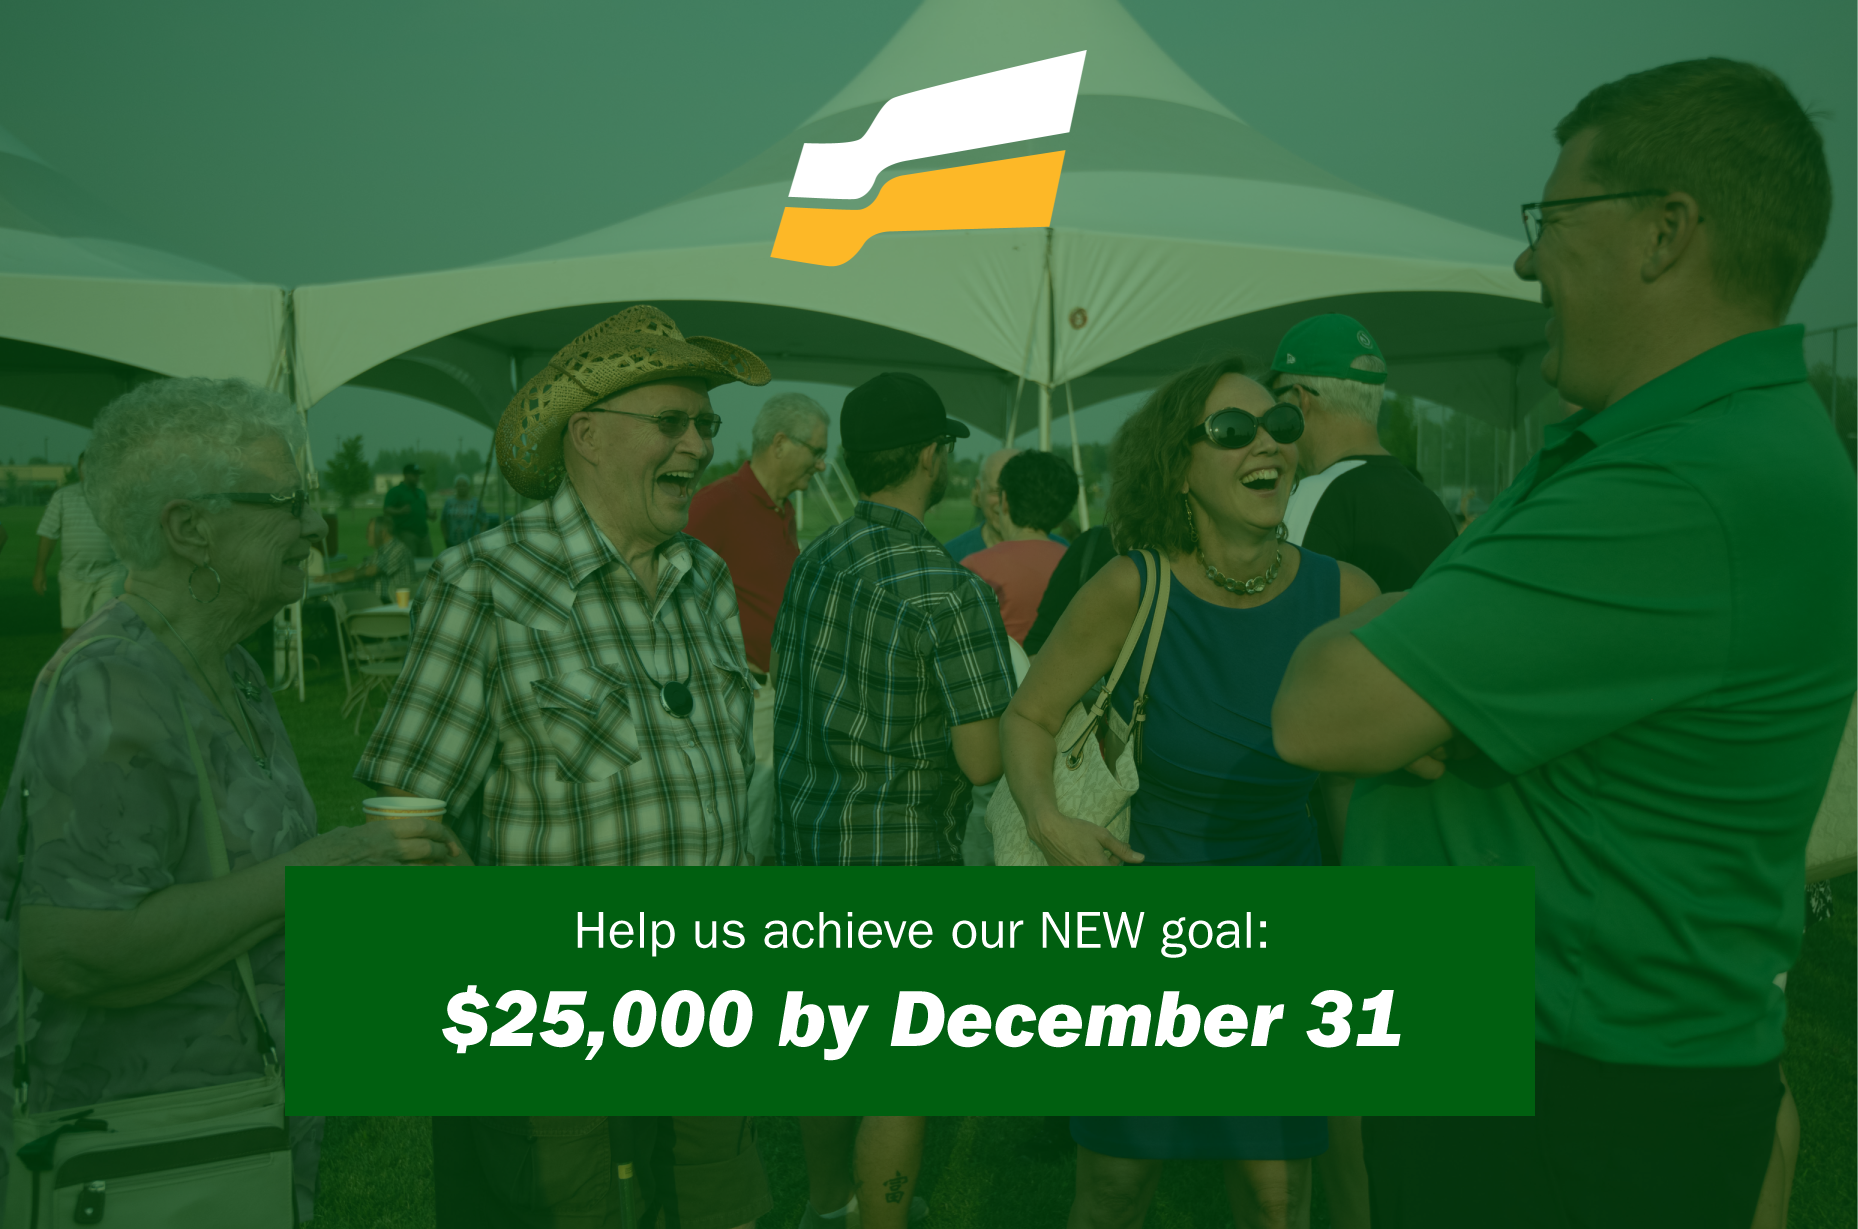 Help us raise $25,000 by December 31